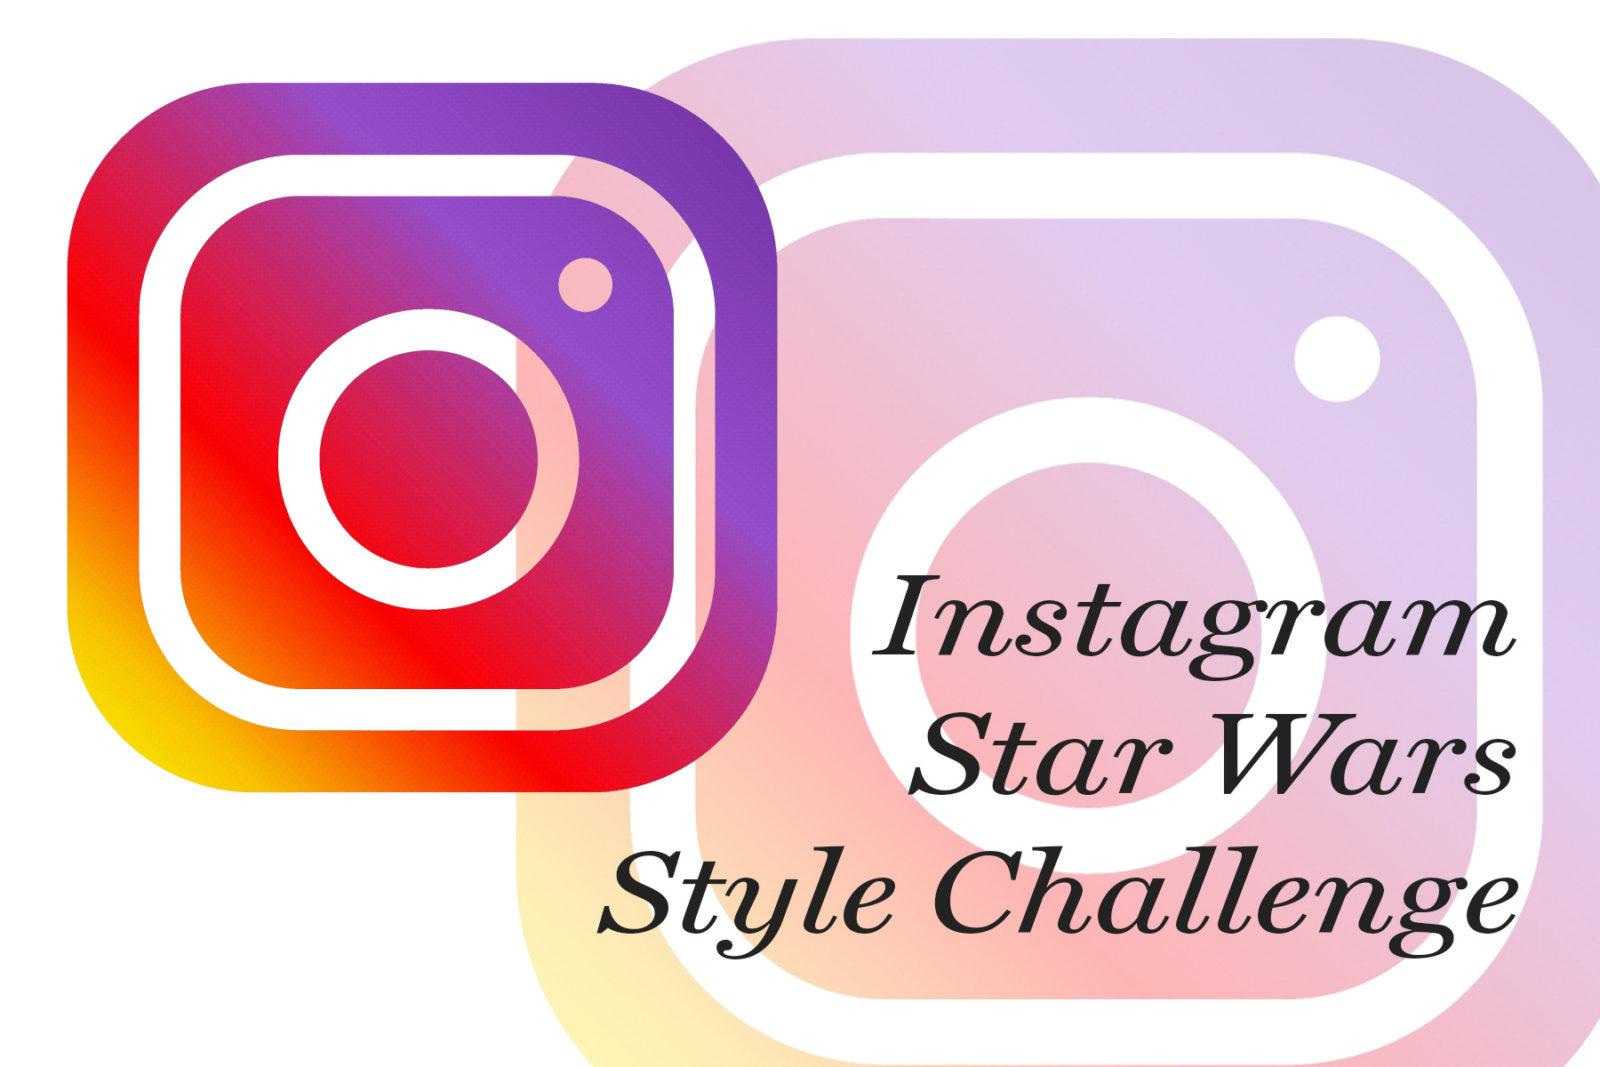 Star Wars Style Challenges on Instagram